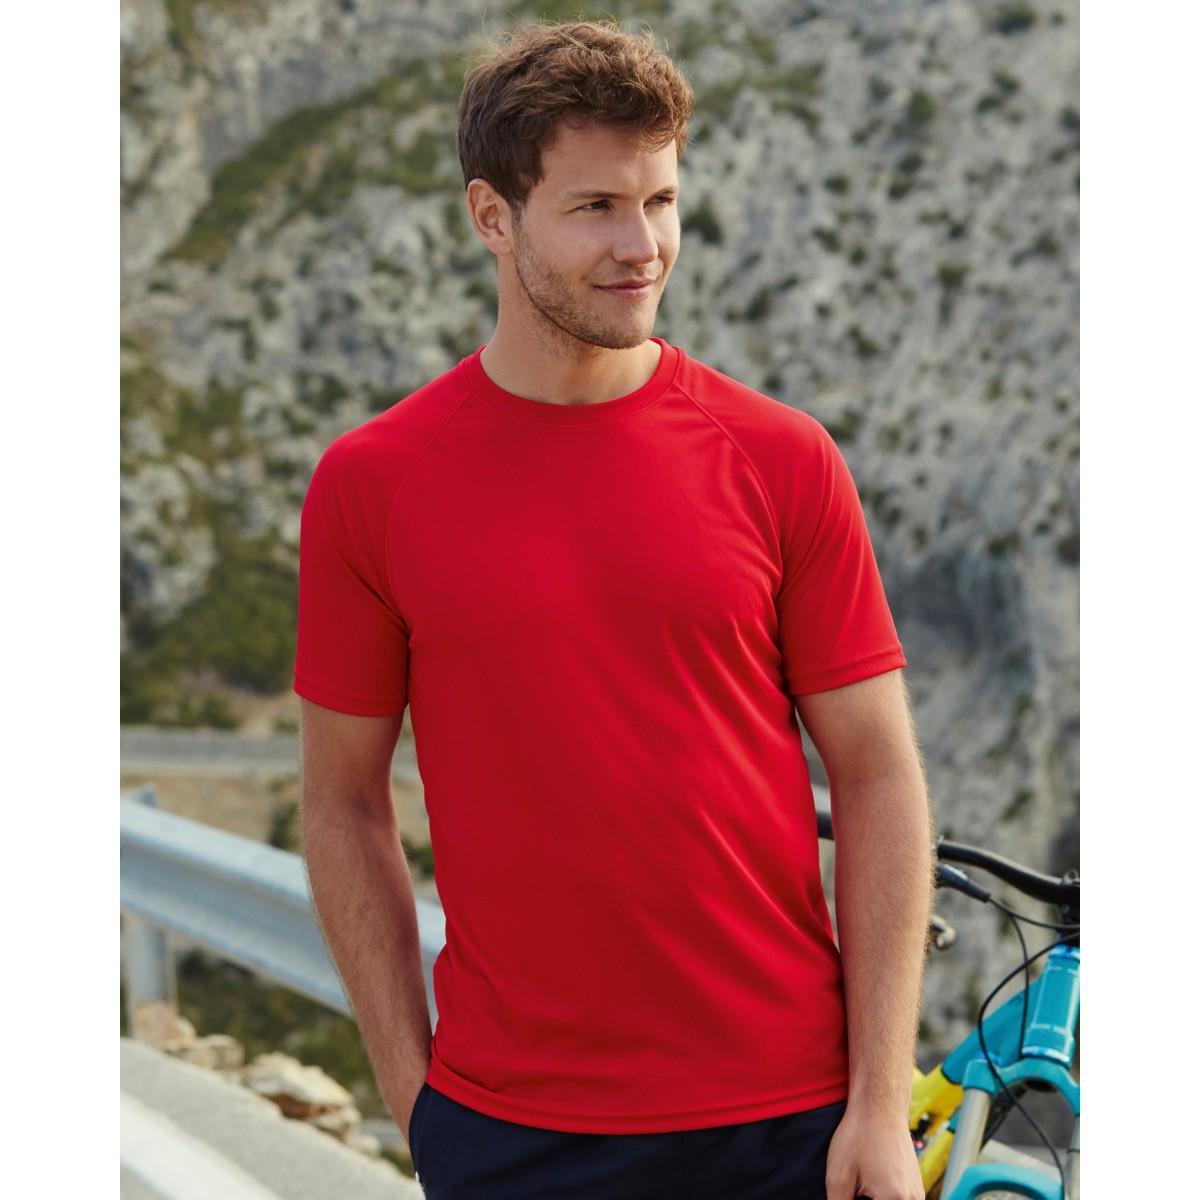 30329f0008 Fruit of the Loom Men's Custom Printed T-shirts